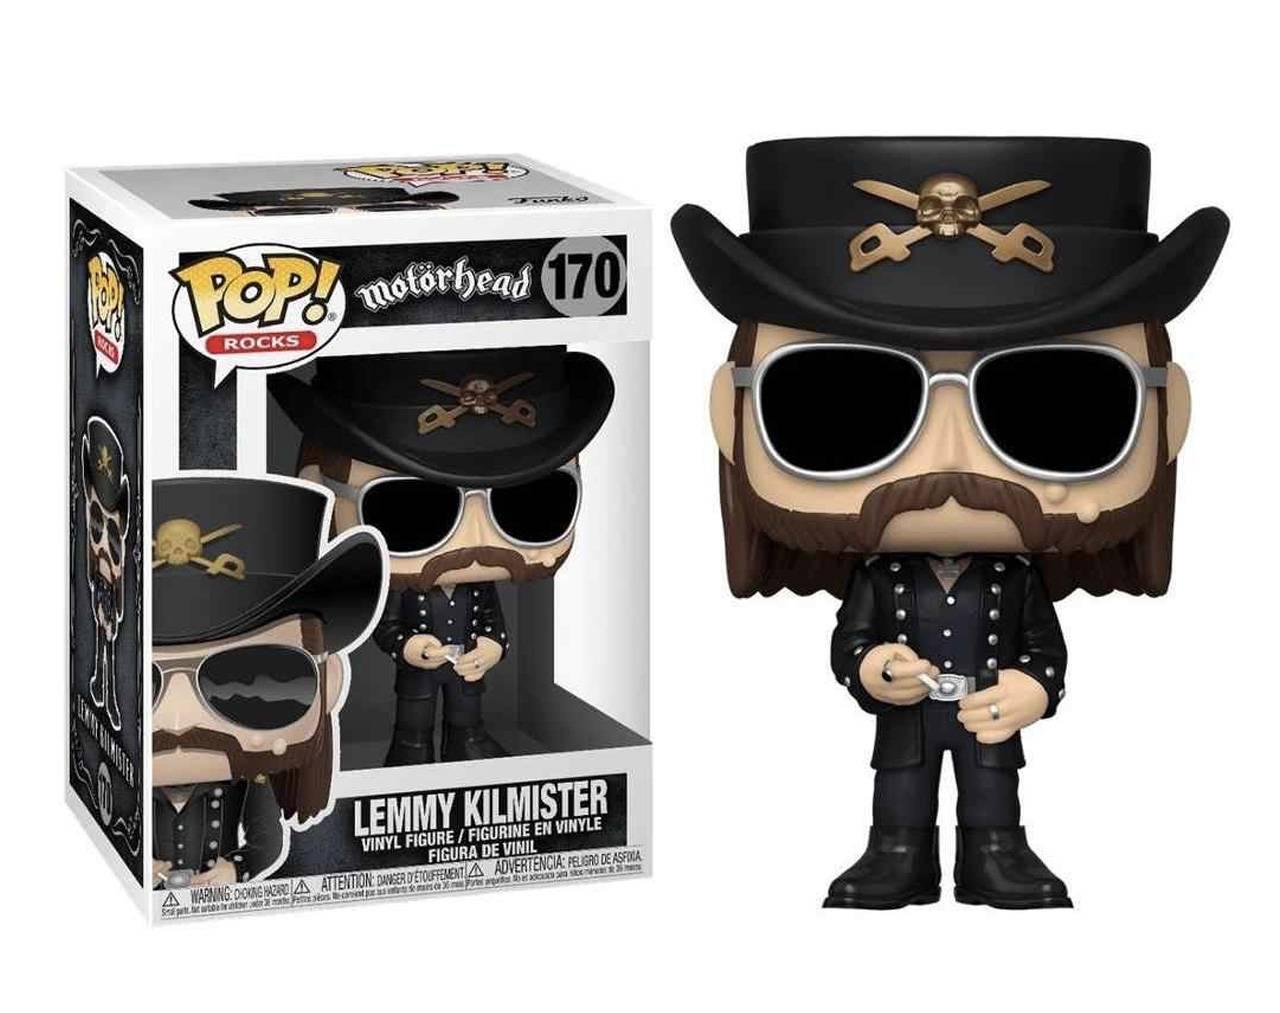 Lemmy Kilmister Pop! Vinyl